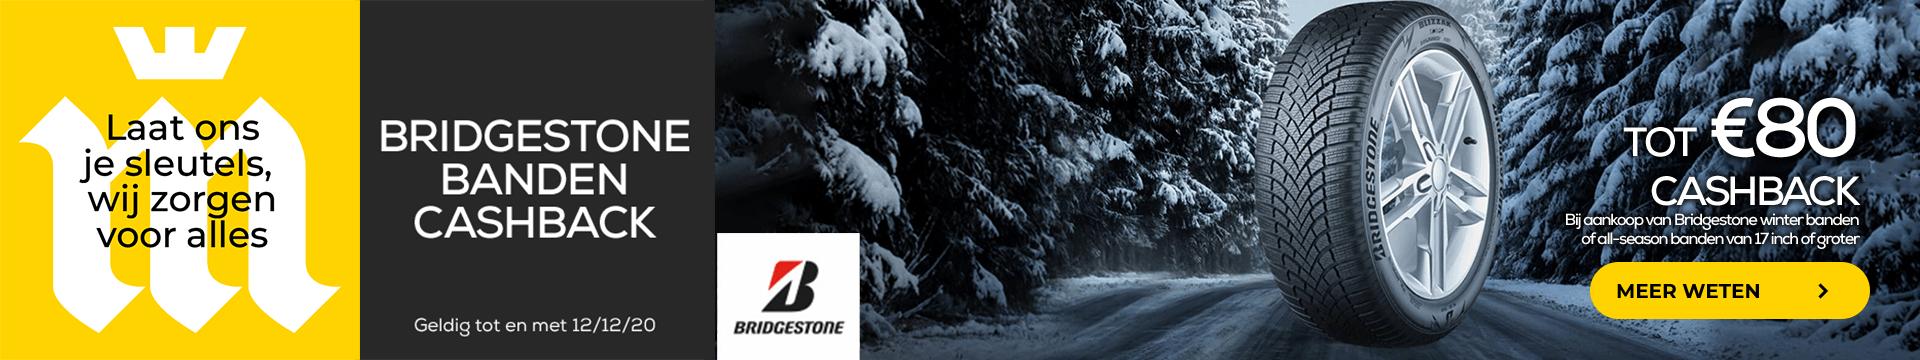 Bridgestone Cashback Actie